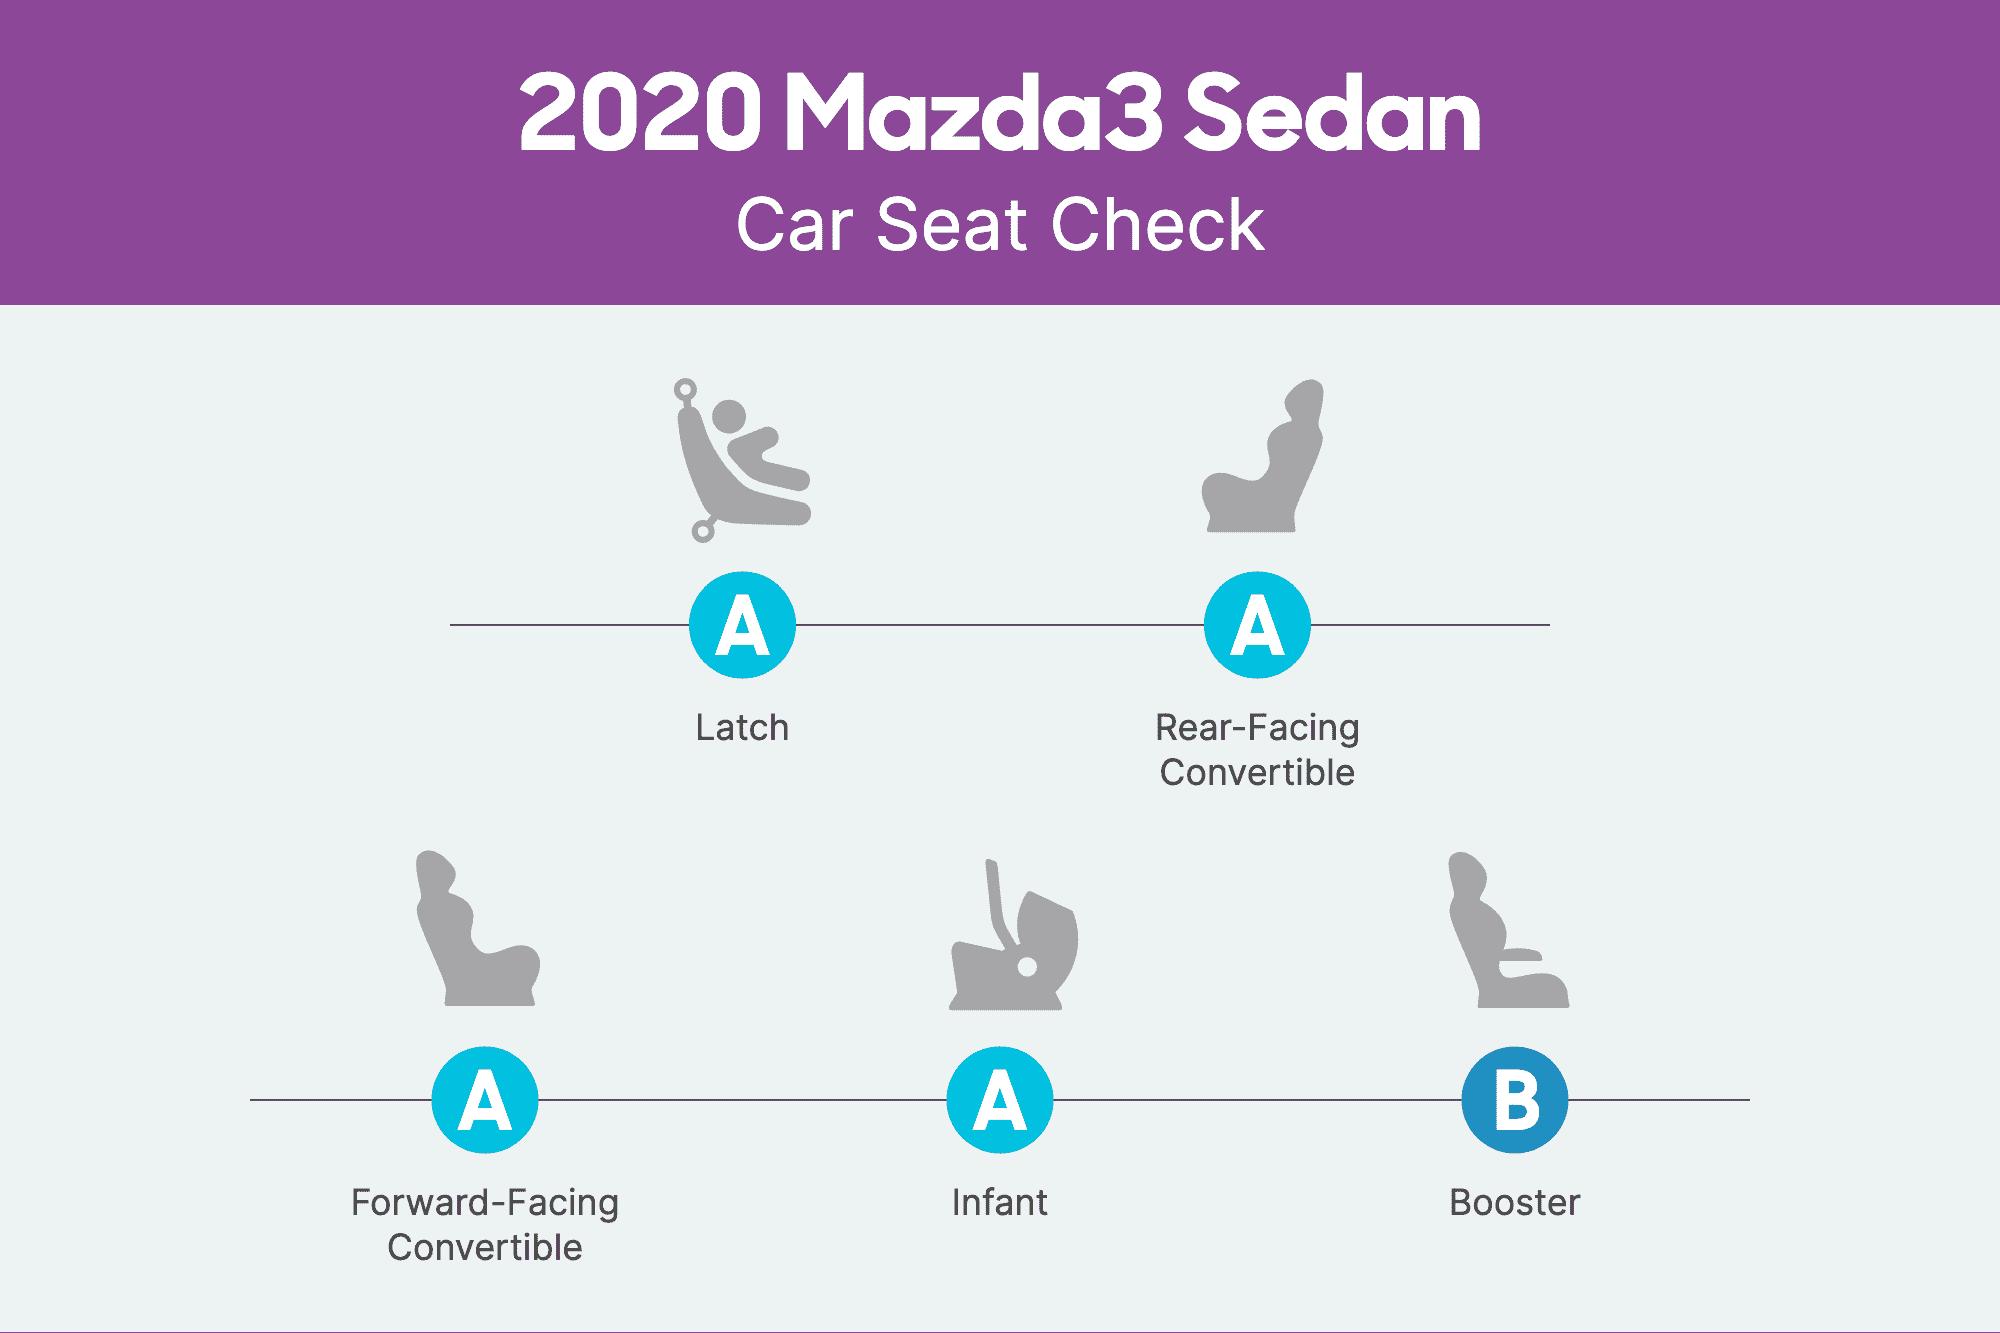 mazda3-sedan-2020-csc-scorecard.png